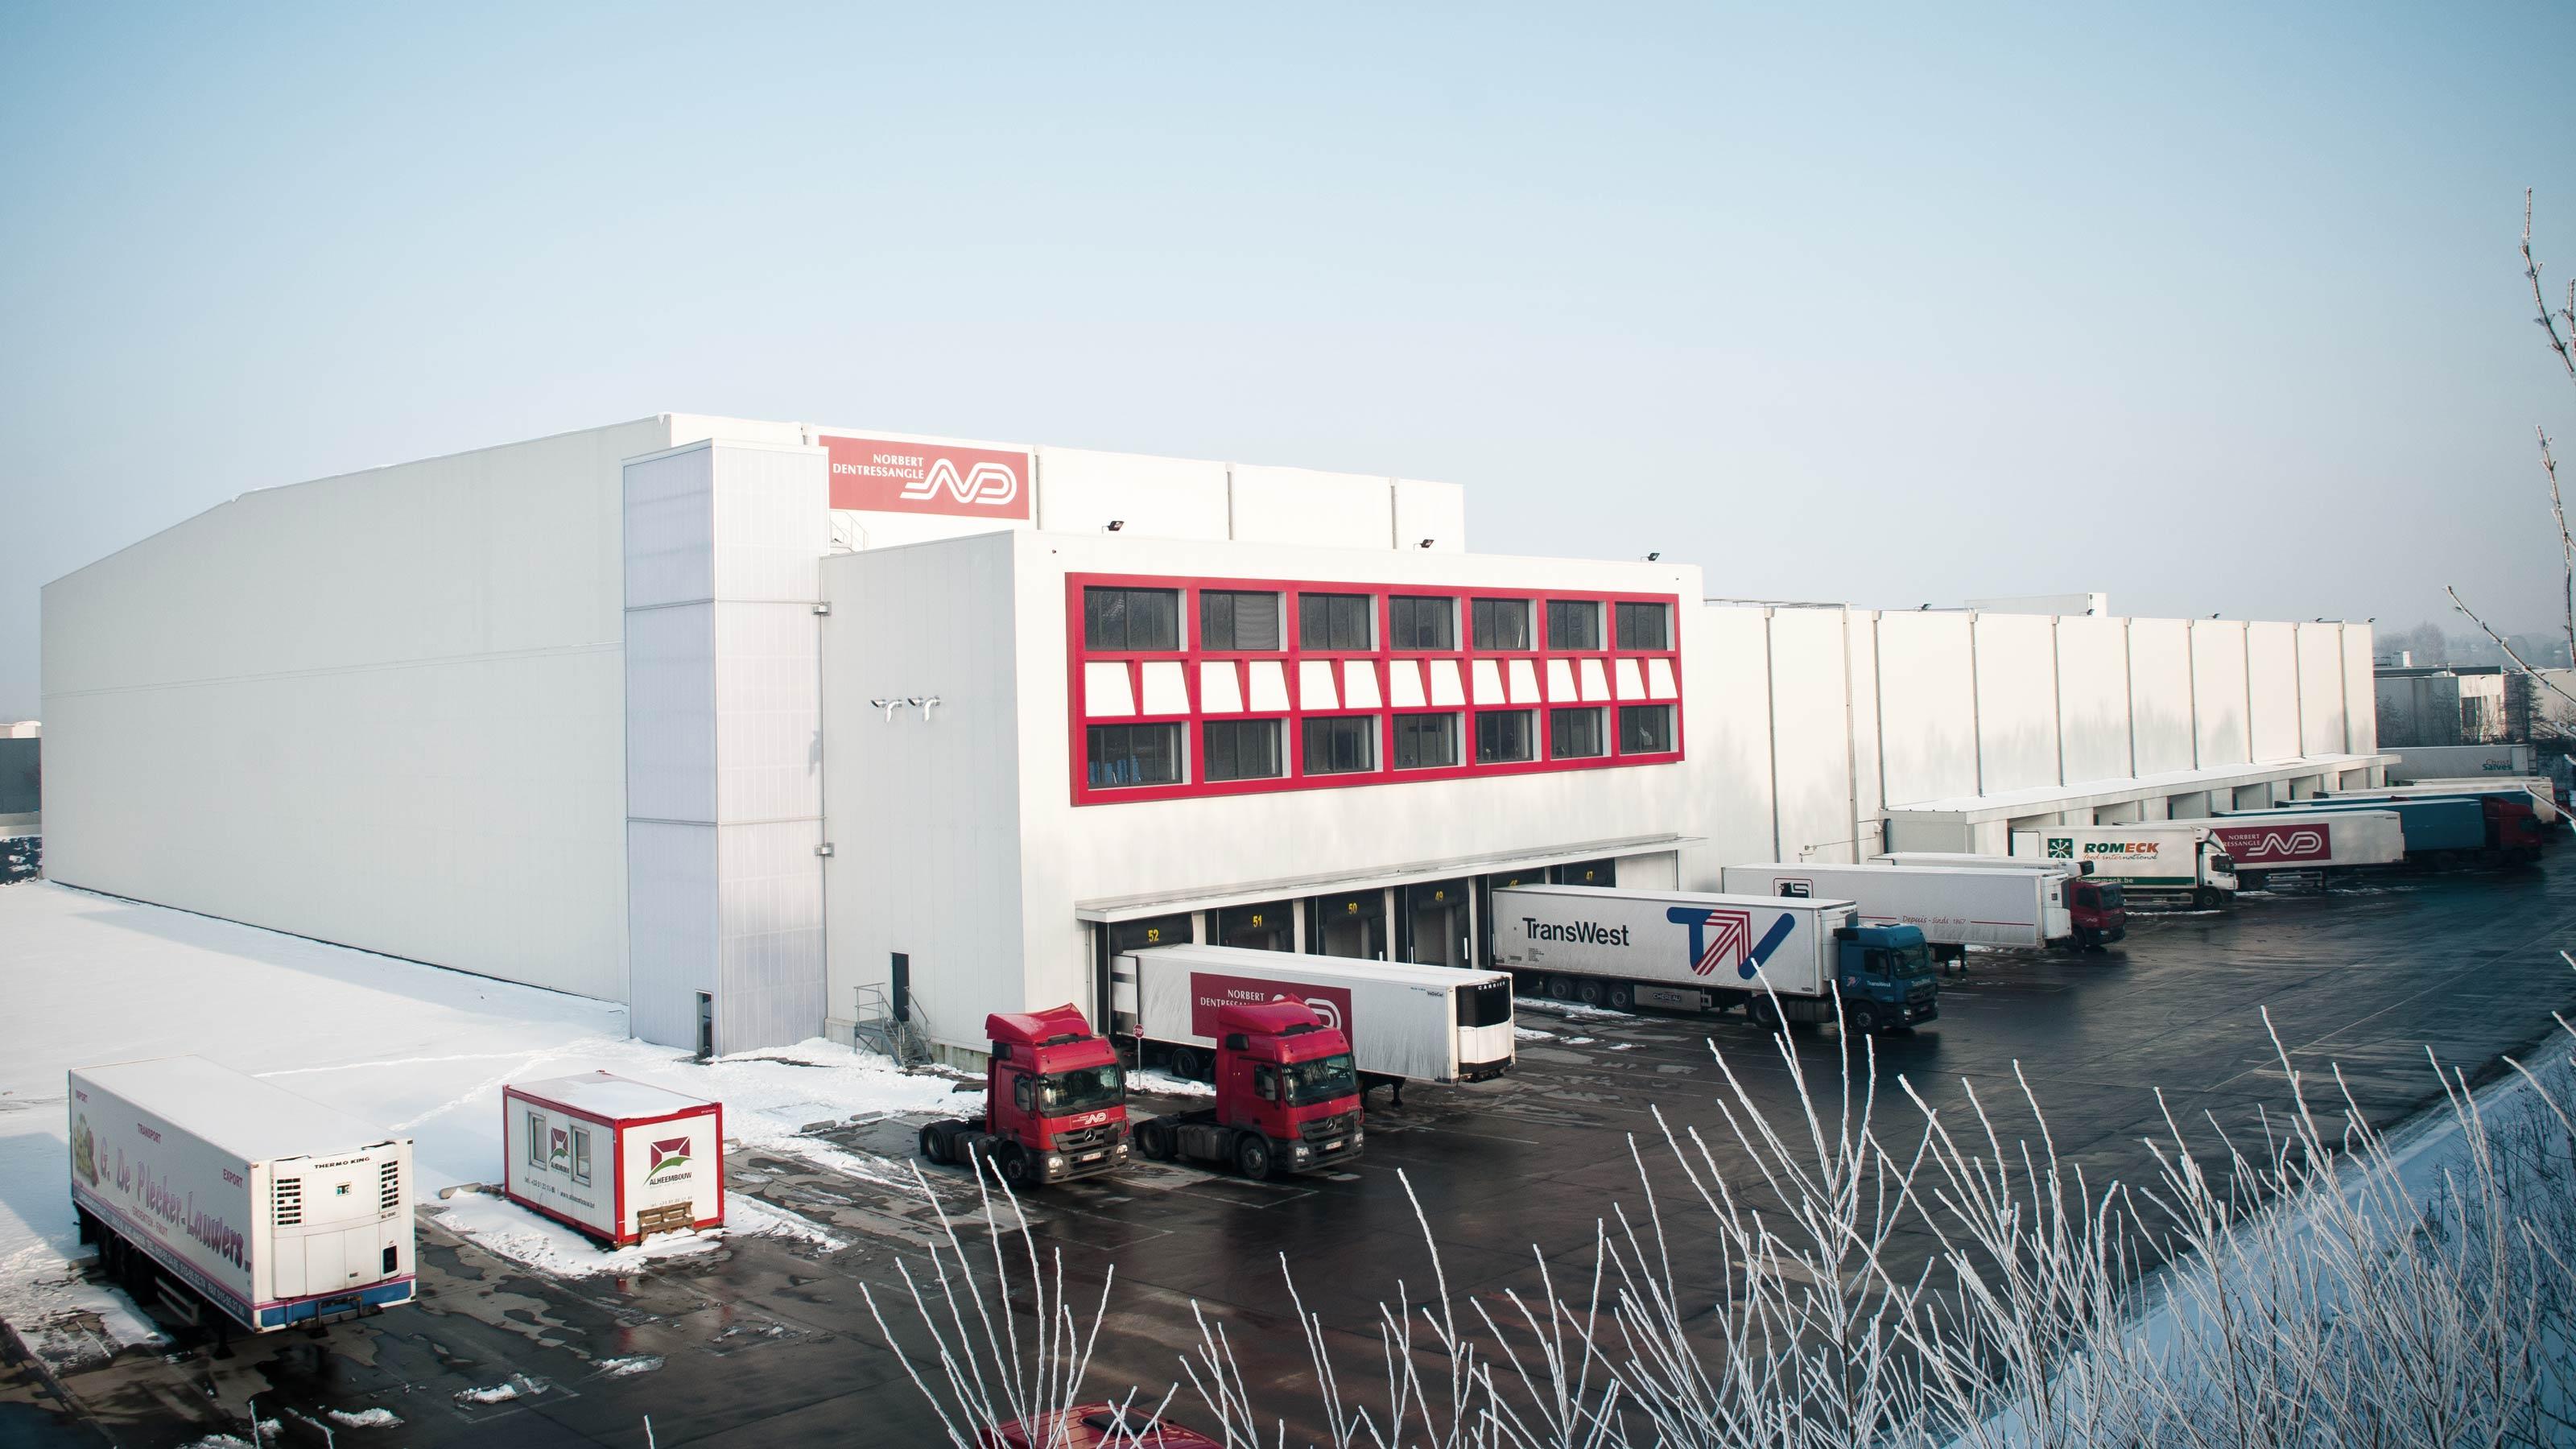 Xpo Logistics Norbert Dentressangle Frozen Food Swisslog